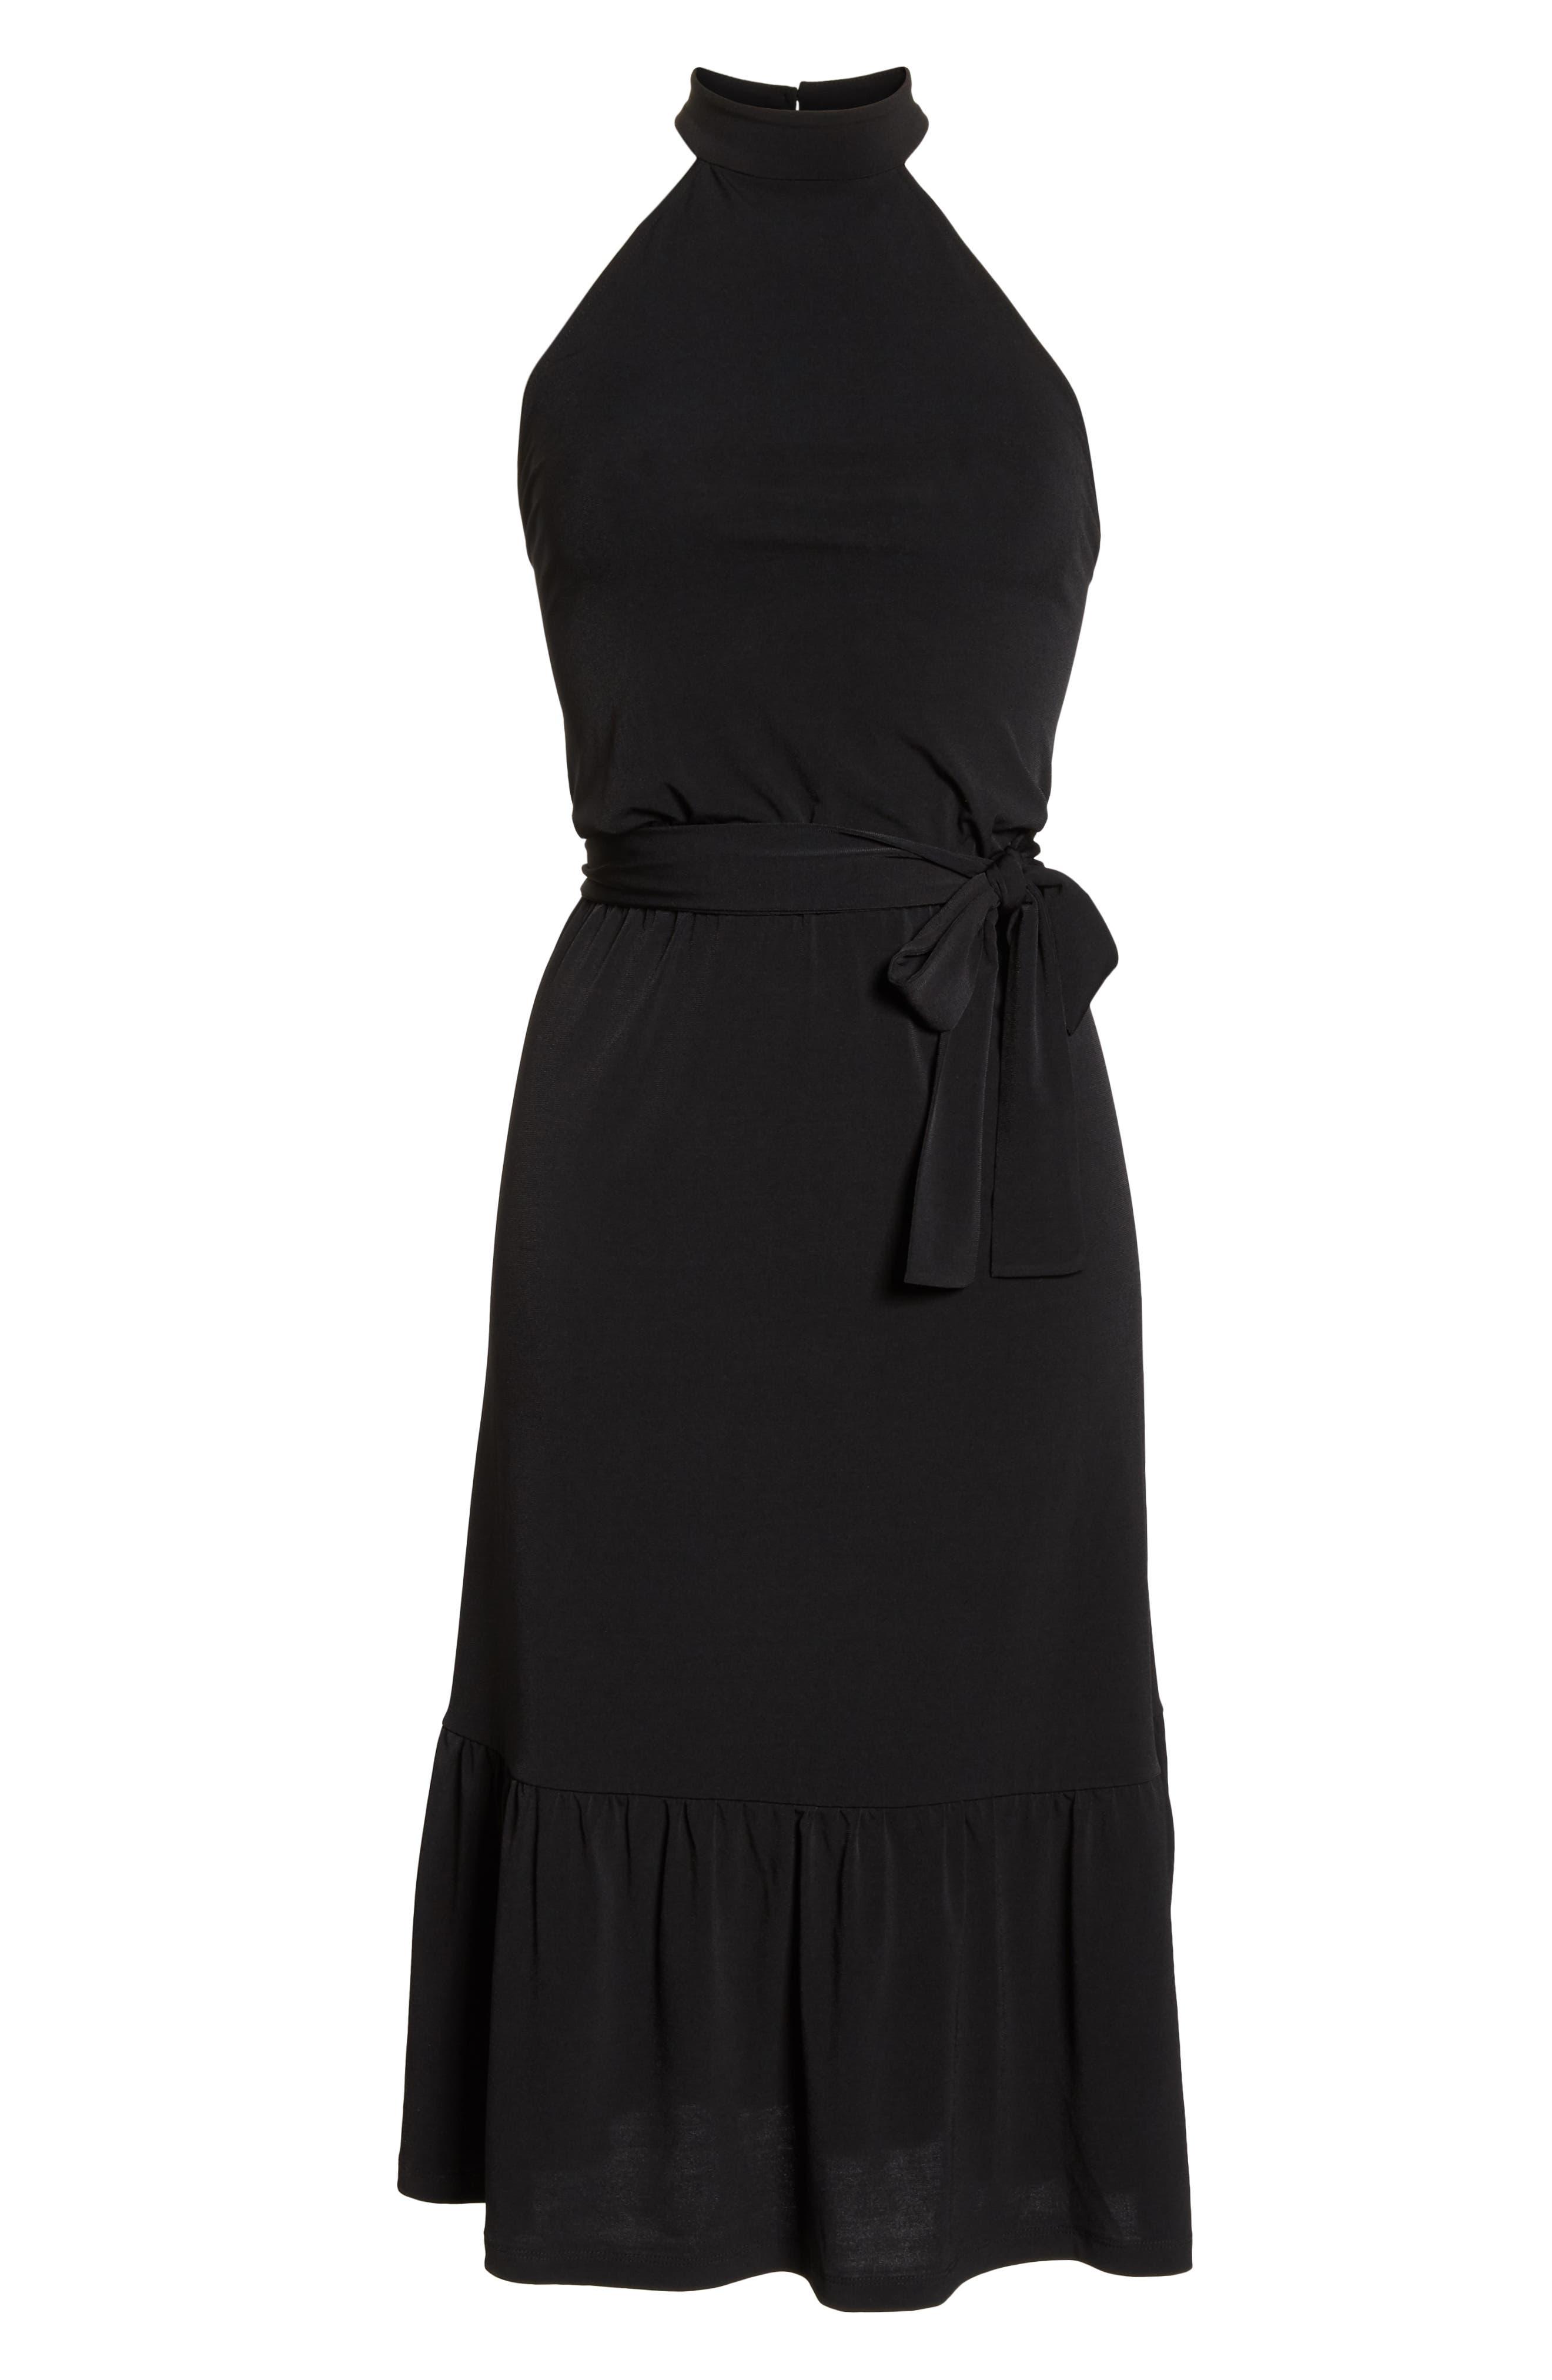 MICHAEL MICHAEL KORS,                             Halter Midi Dress,                             Alternate thumbnail 7, color,                             BLACK